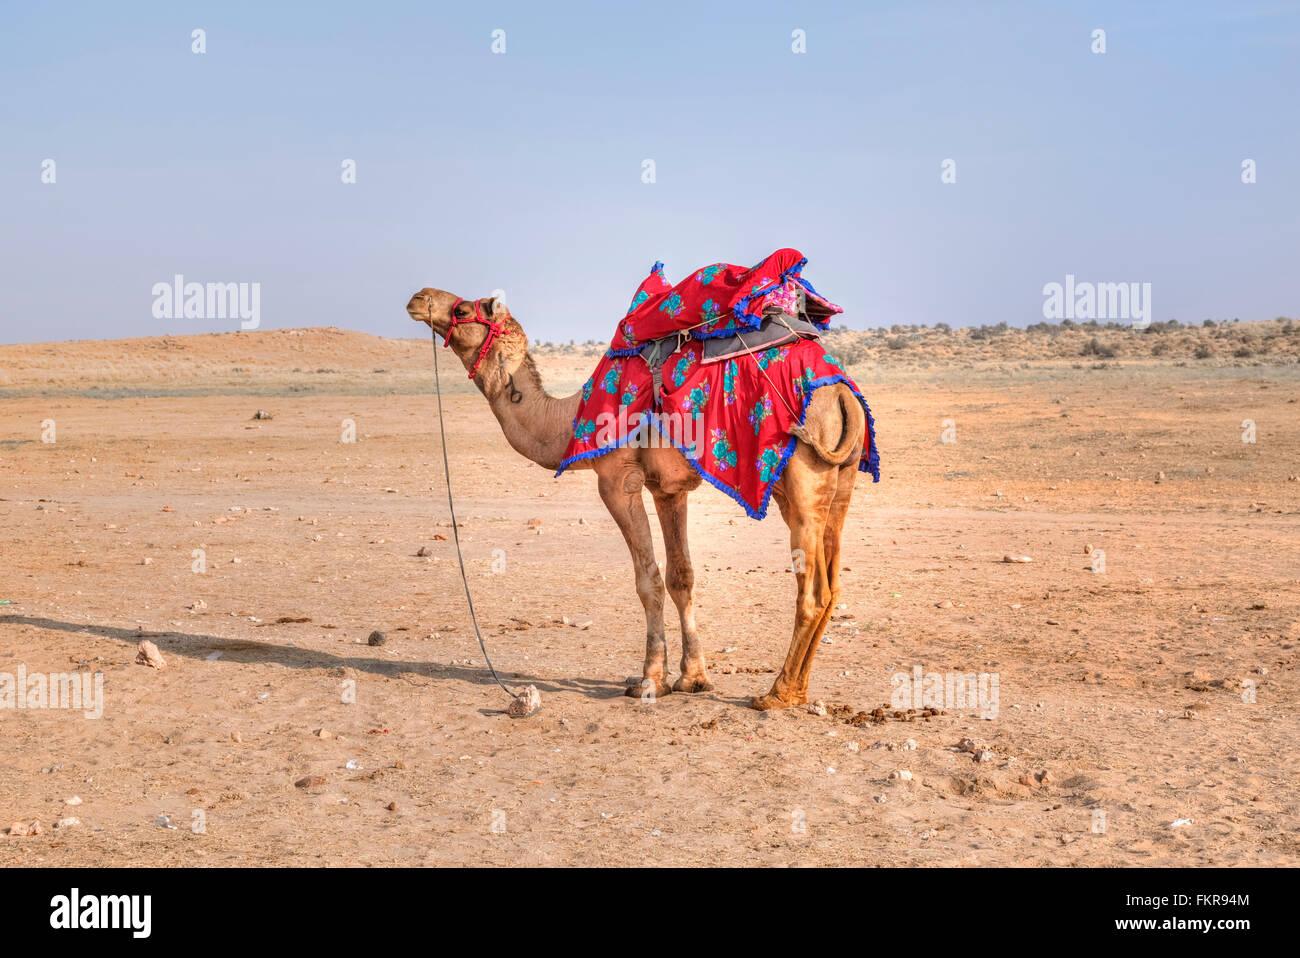 camel of Nomadic people in the Thar desert, Rajasthan, India - Stock Image